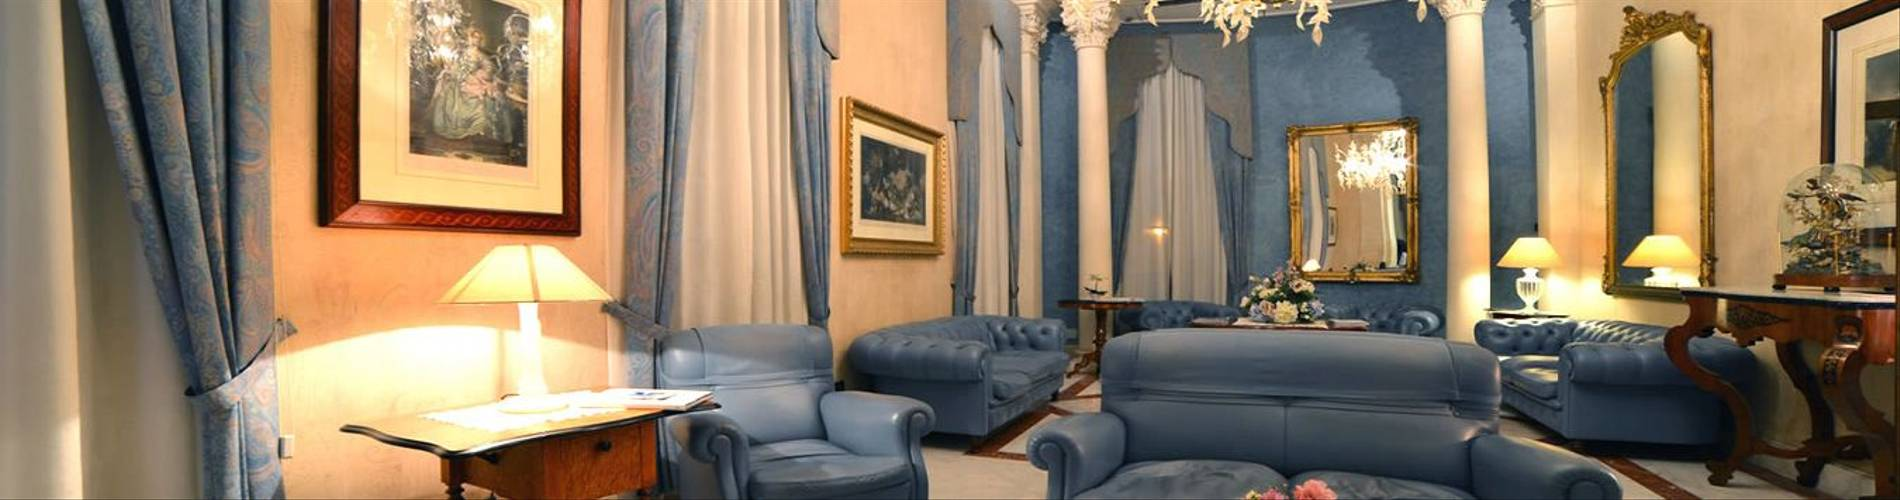 Grand Hotel Ortigia, Sicily, Italy (17).jpg